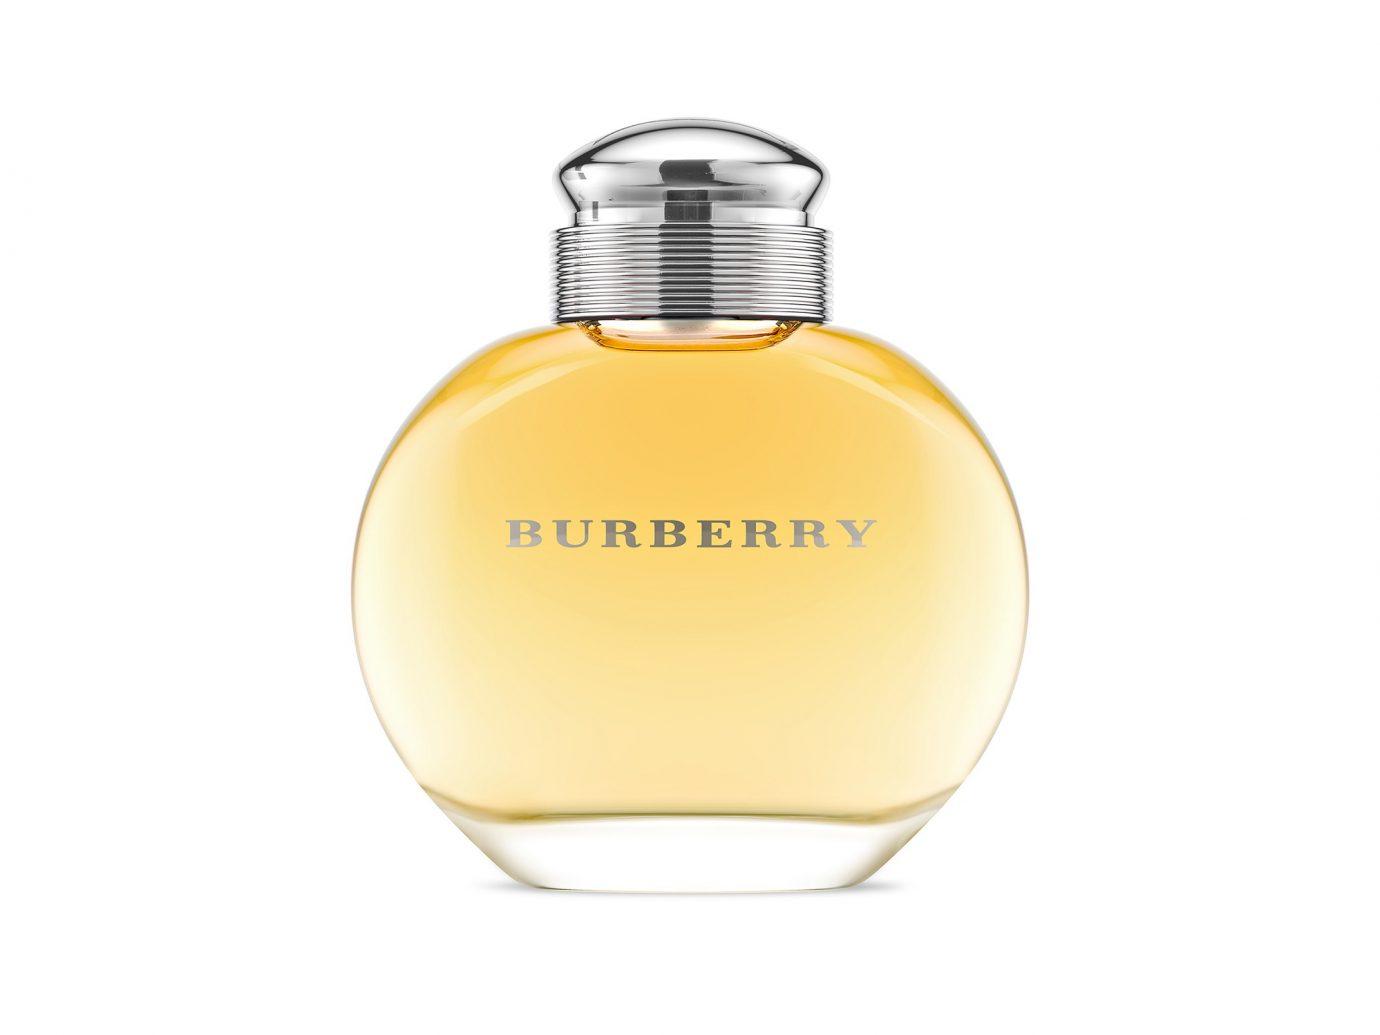 Burberry Classic for Women Eau de Parfum